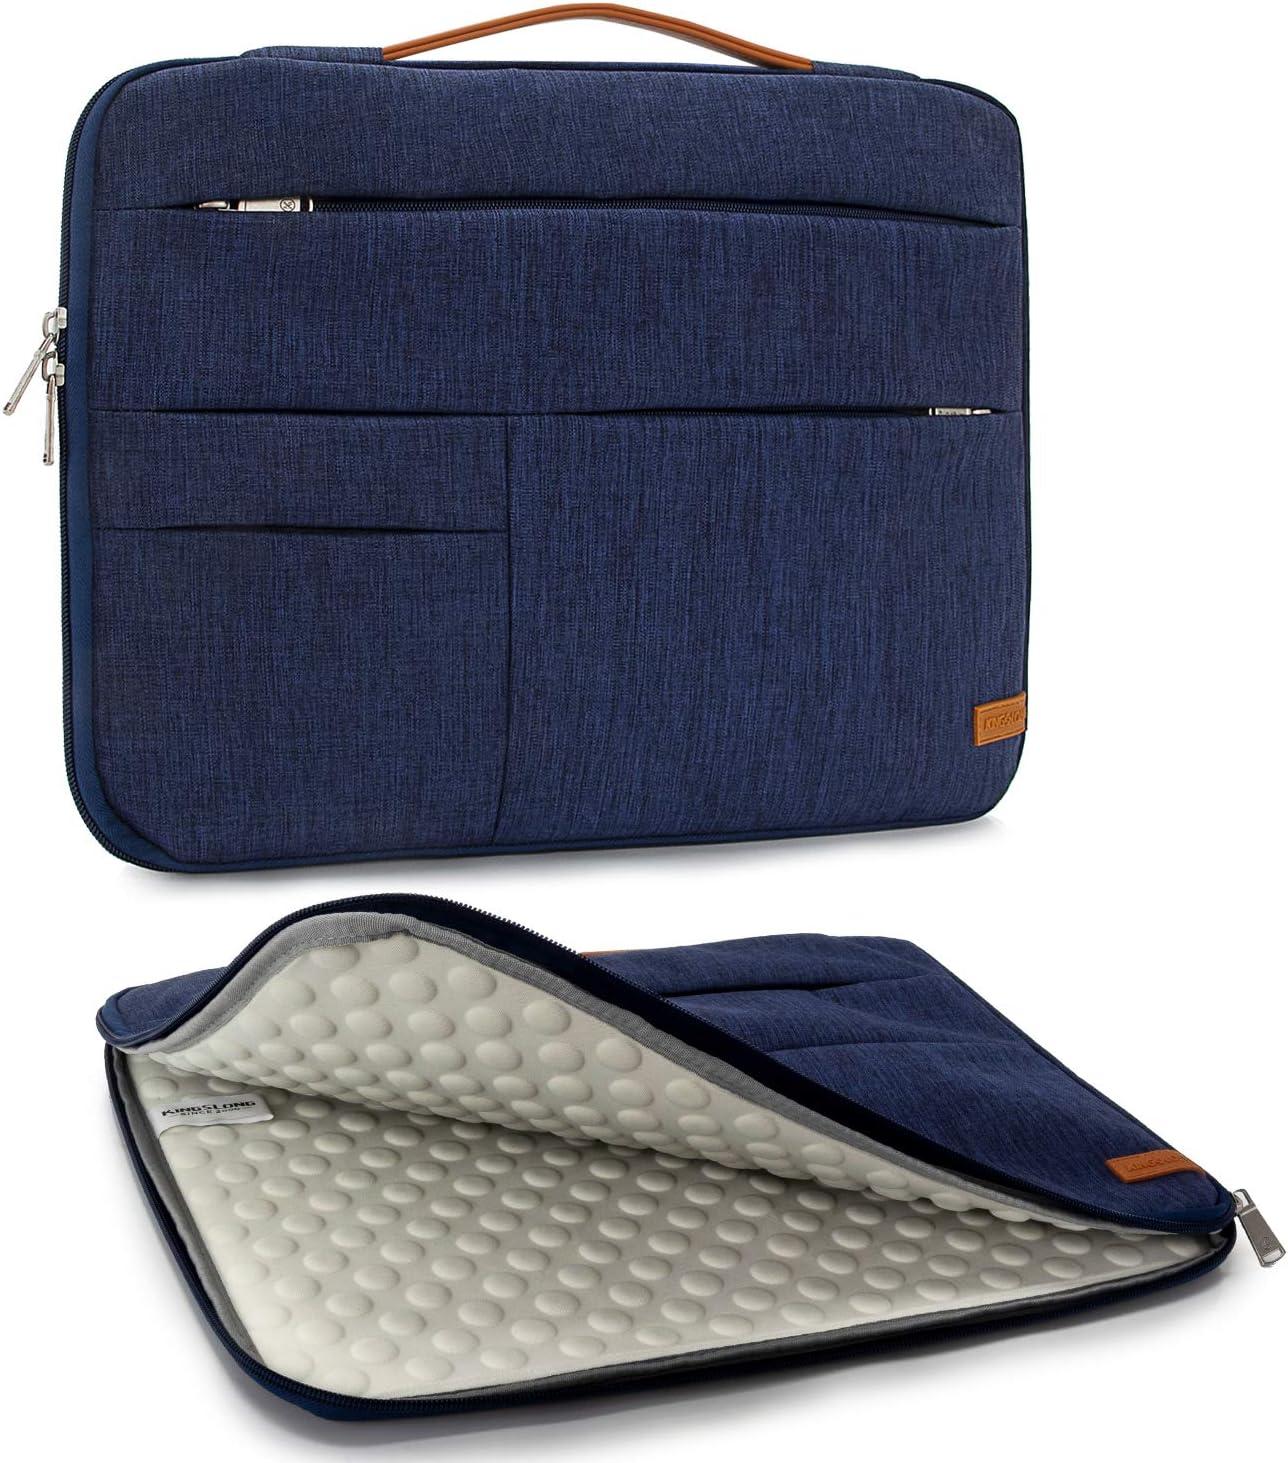 KINGSLONG Laptop Bag for Men Women 17 Inch Laptop Case Notebook Protective Bag Commute Briefcase Laptop Sleeve Messenger Bag Tablet Case Computer Bags Slim Handbag Commute Bags Business